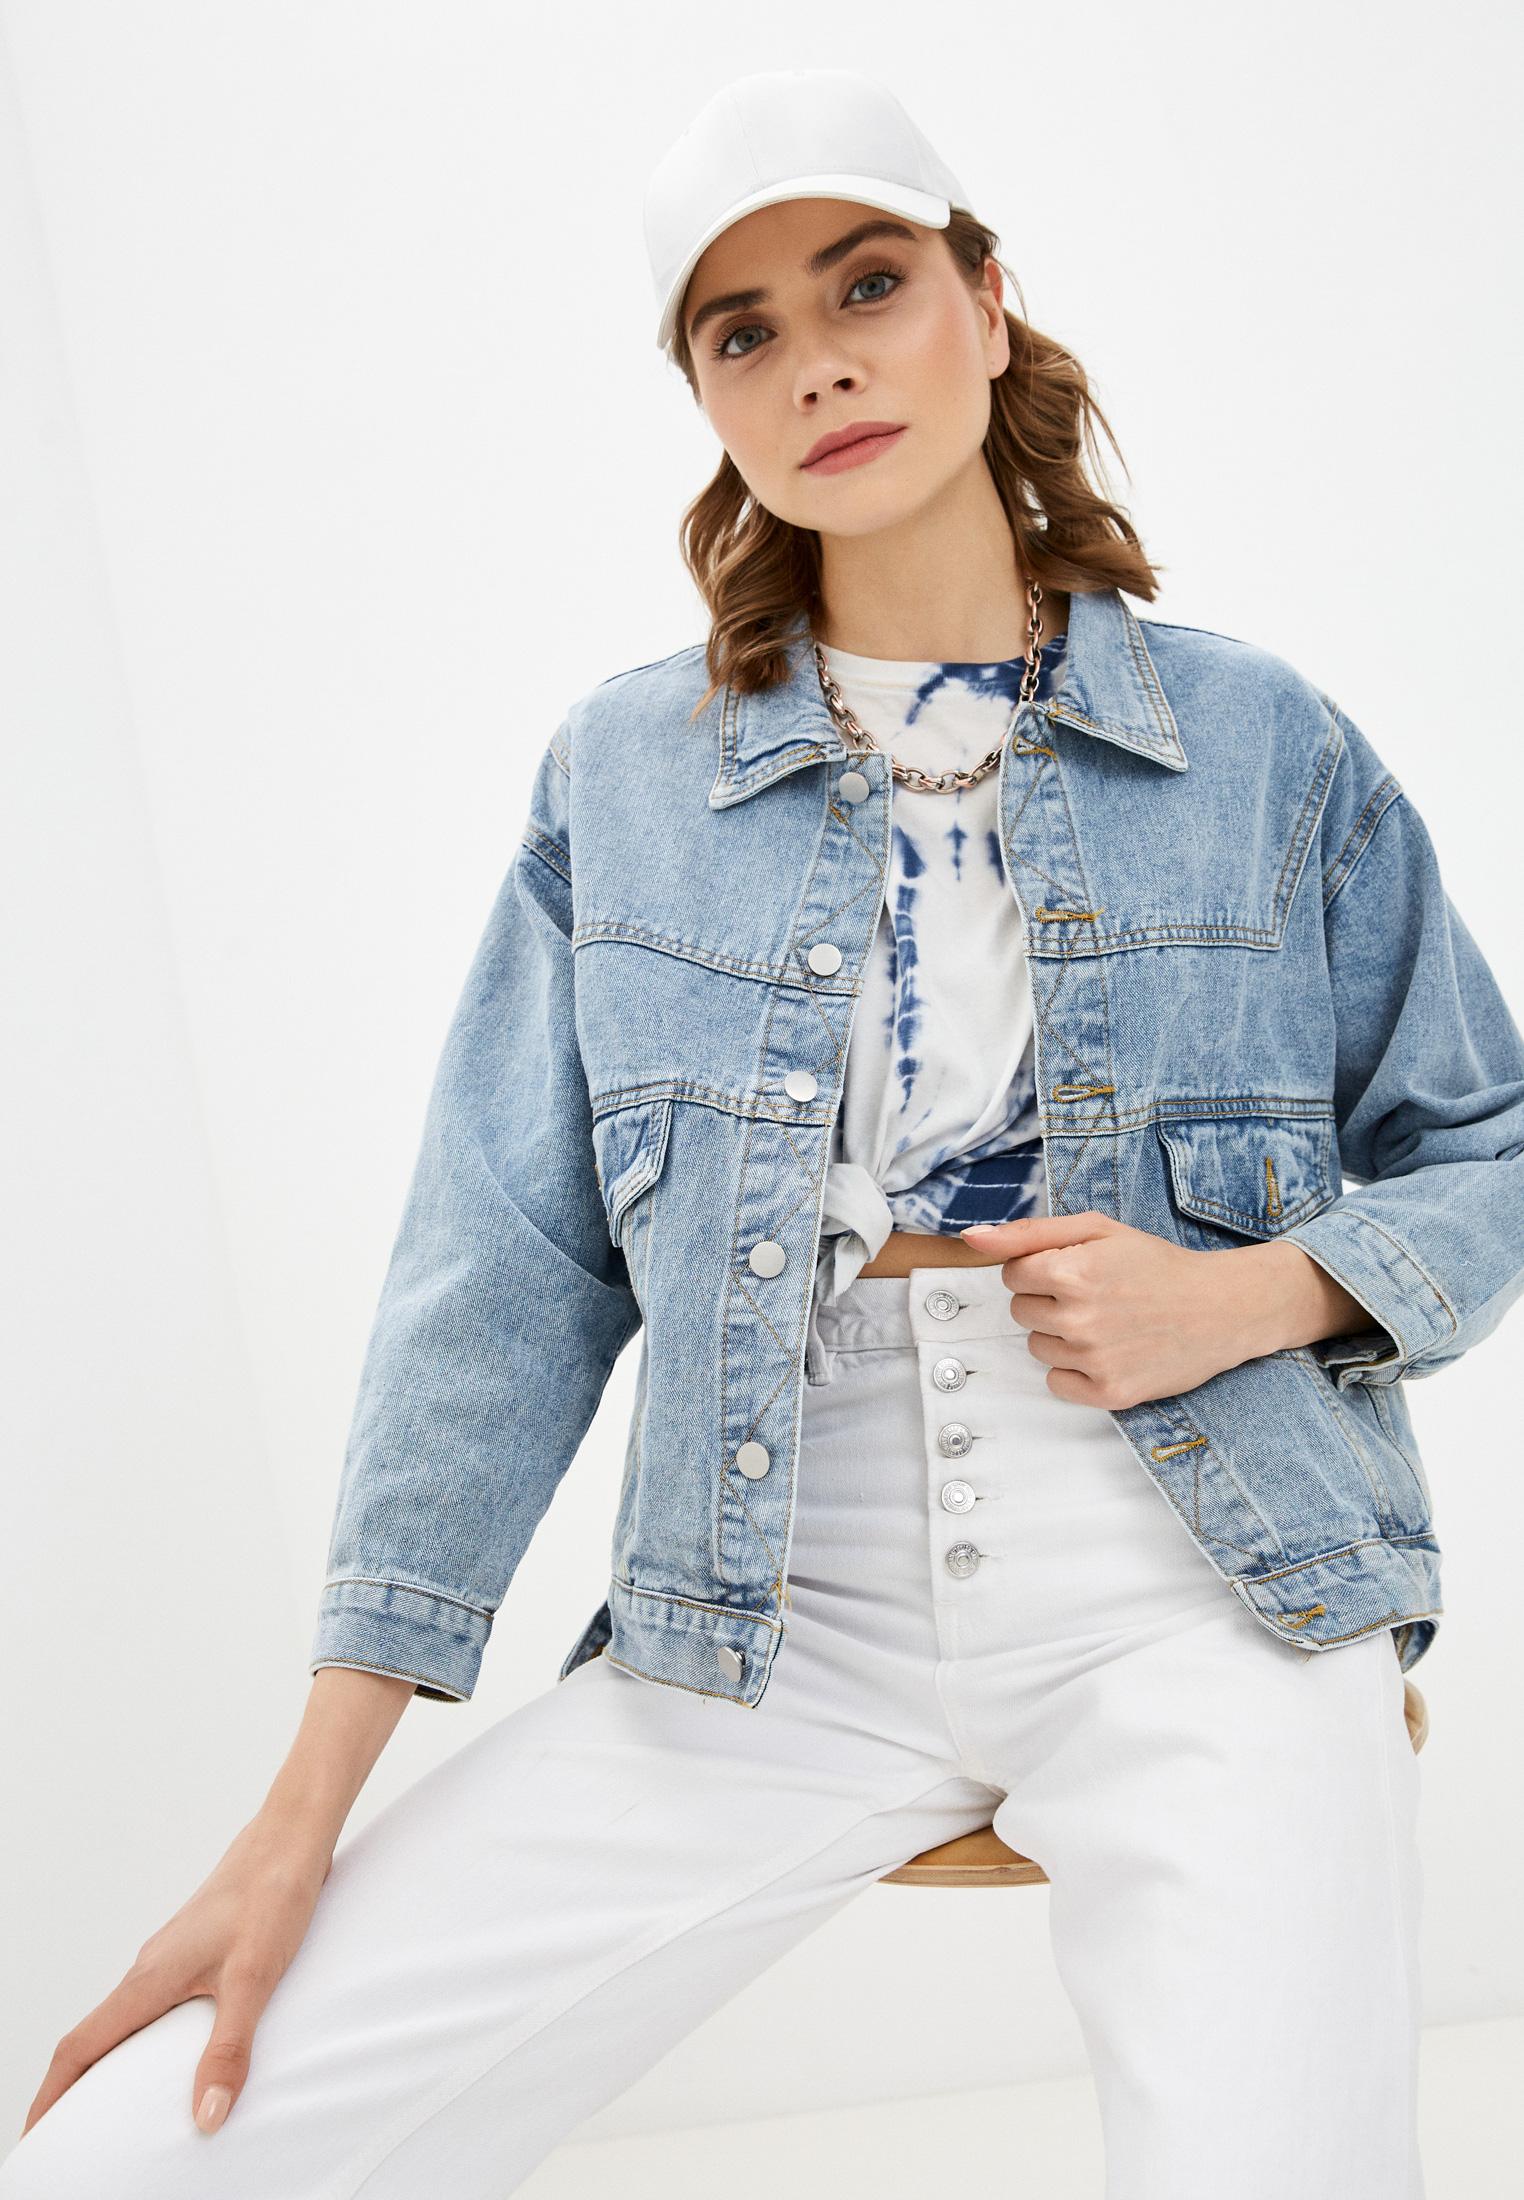 Джинсовая куртка Miss Gabby Куртка джинсовая Miss Gabby